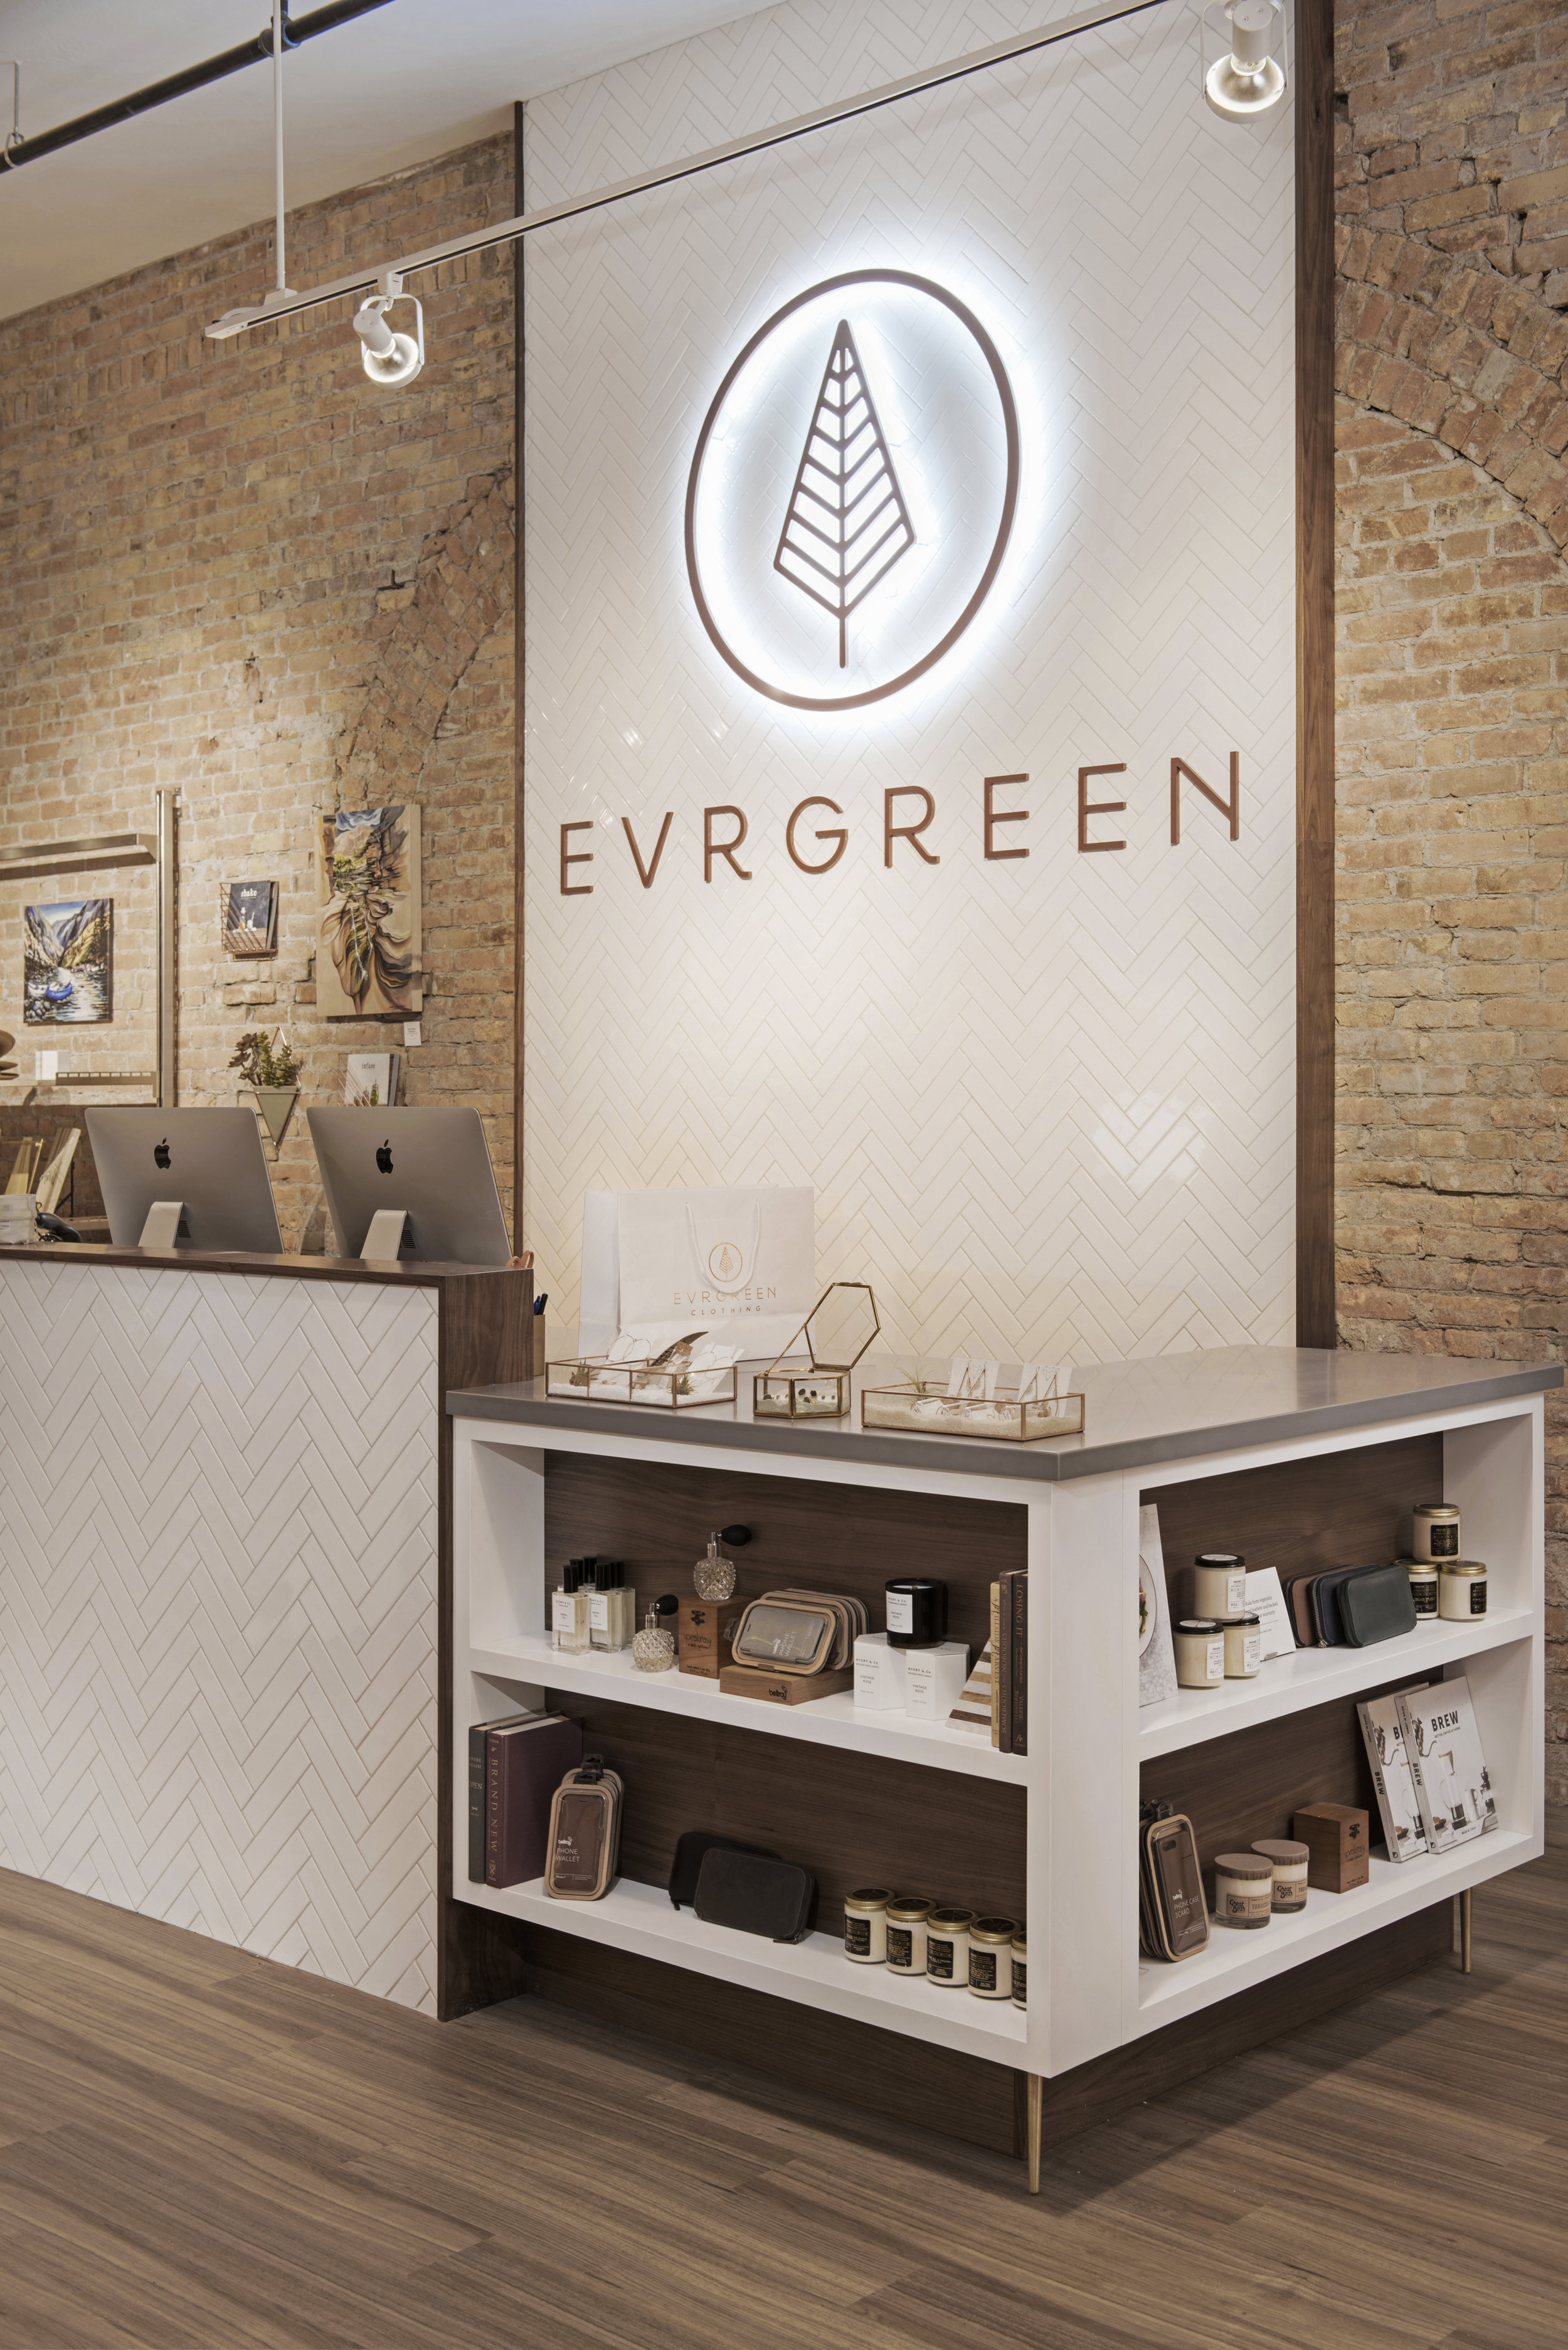 Evrgreen Clothing Company| Bozeman |MT